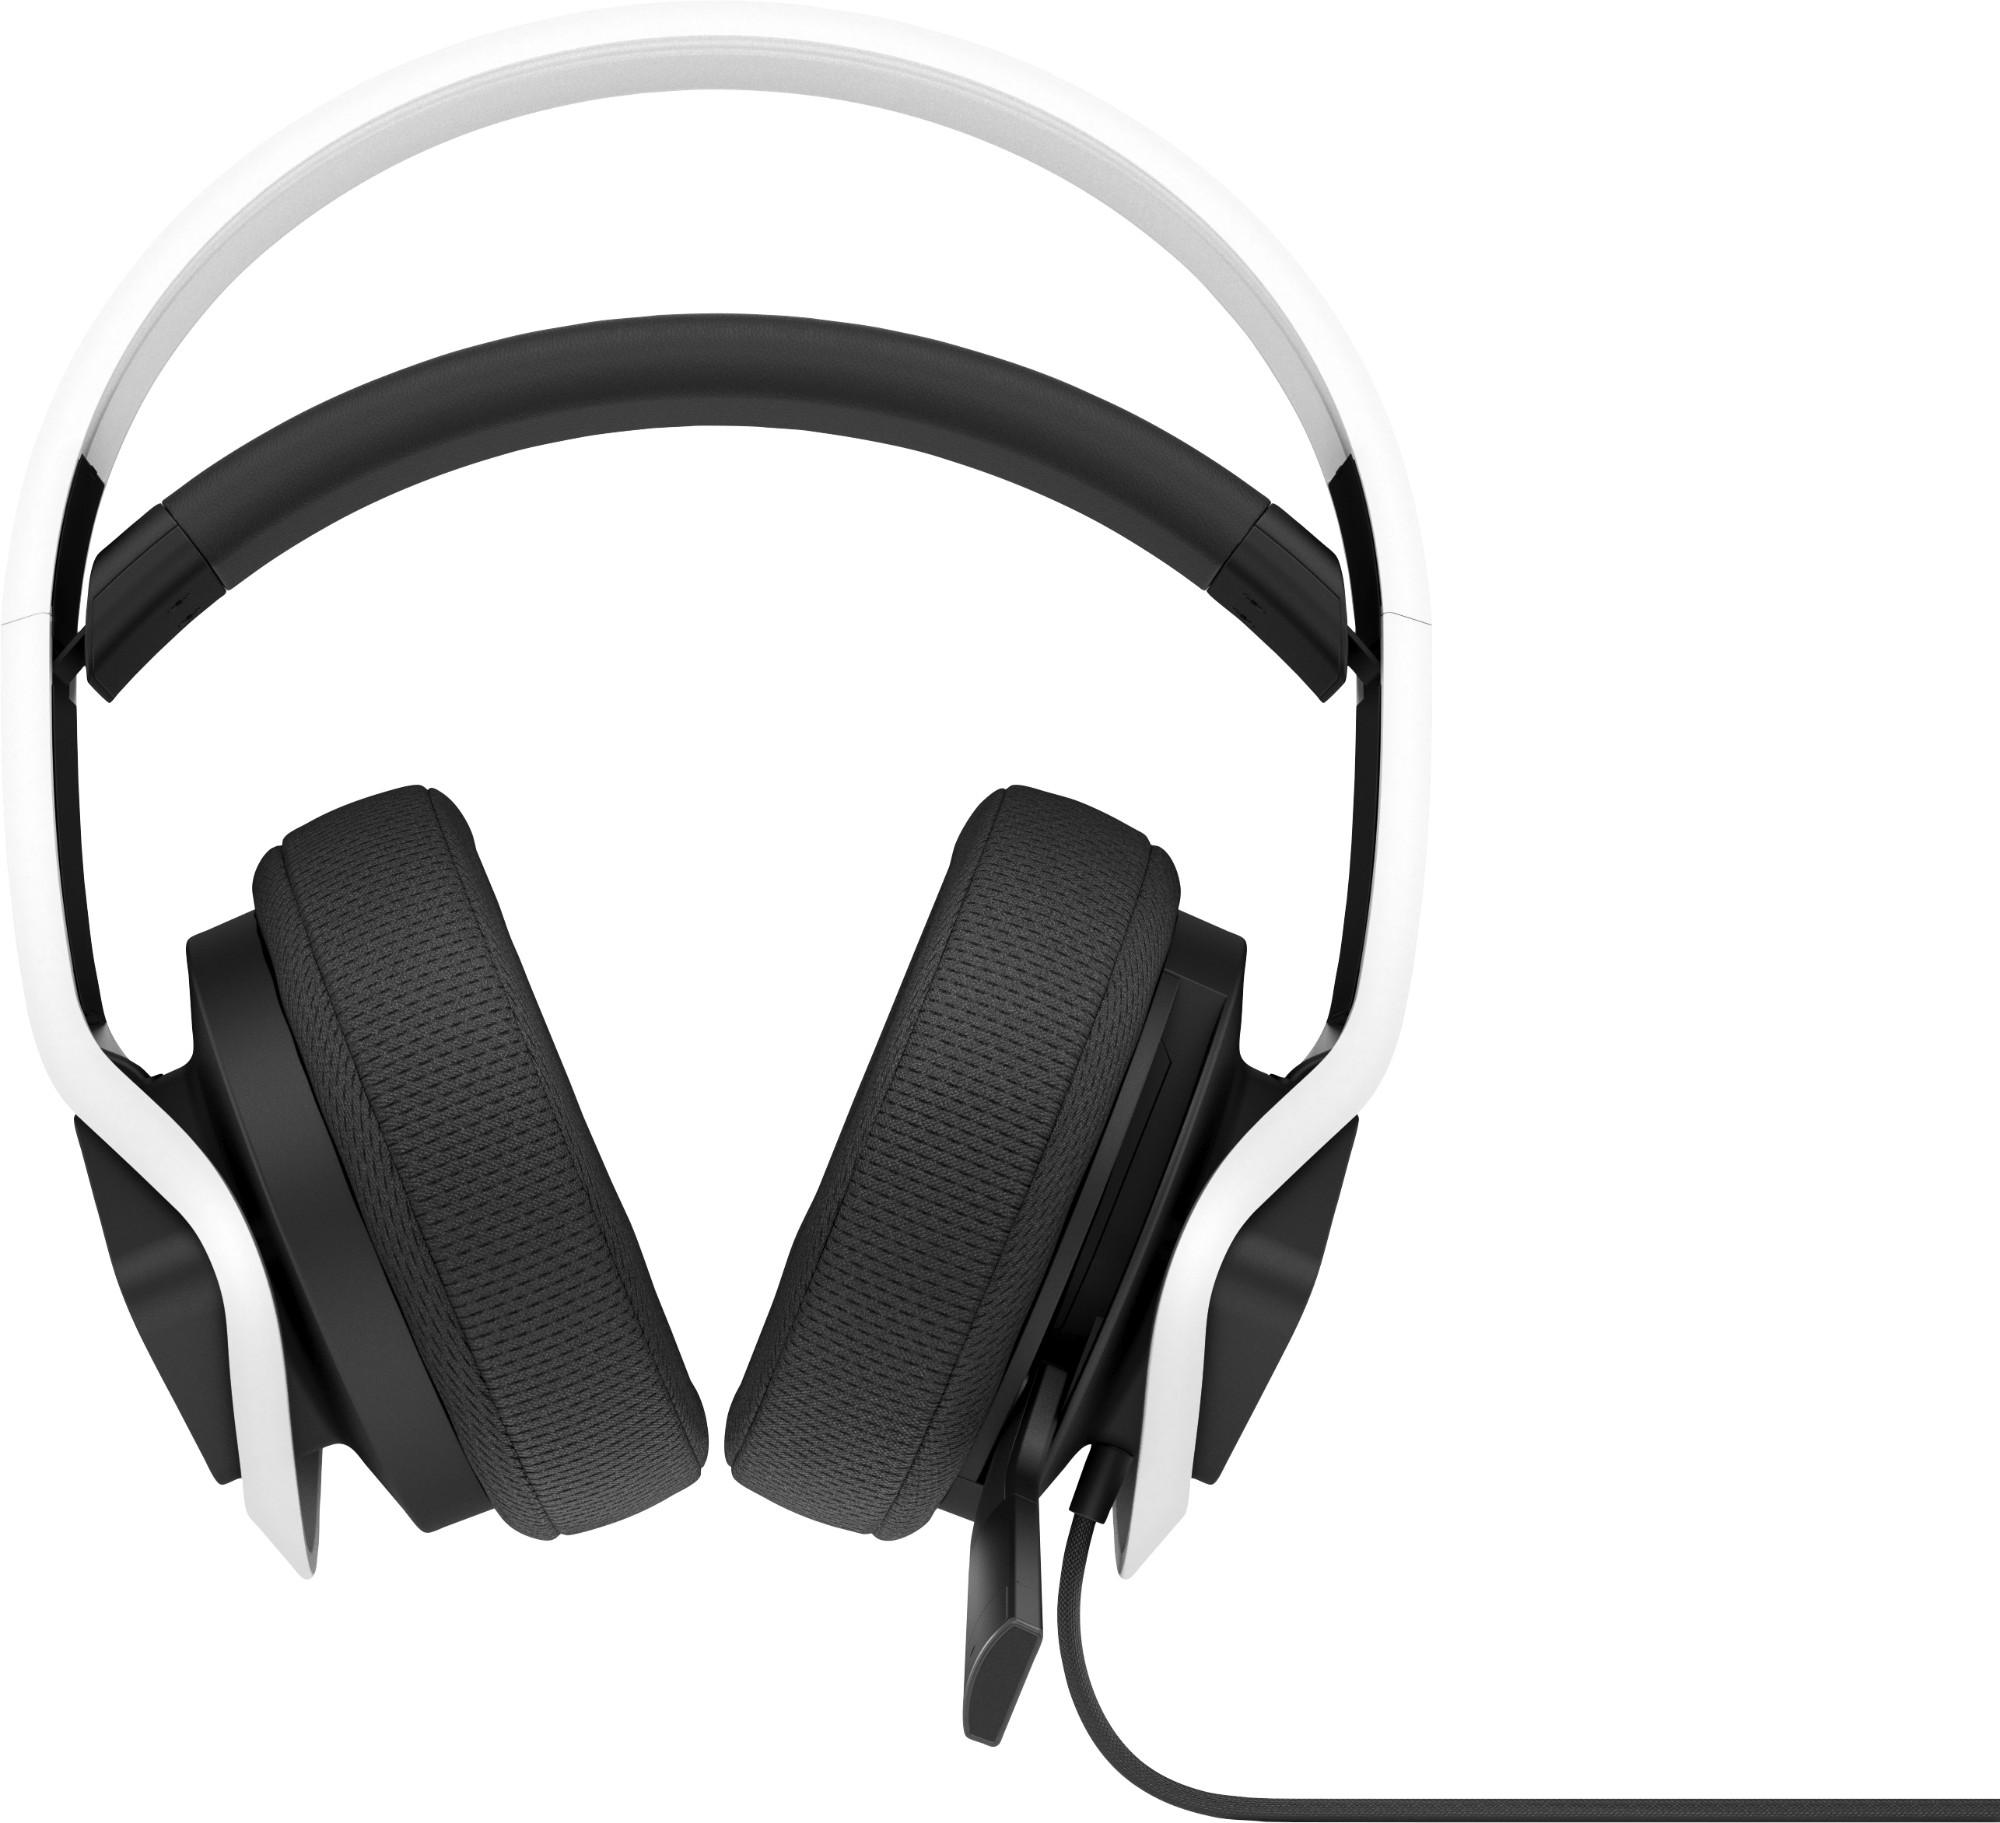 OMEN by HP Mindframe Prime Headset White